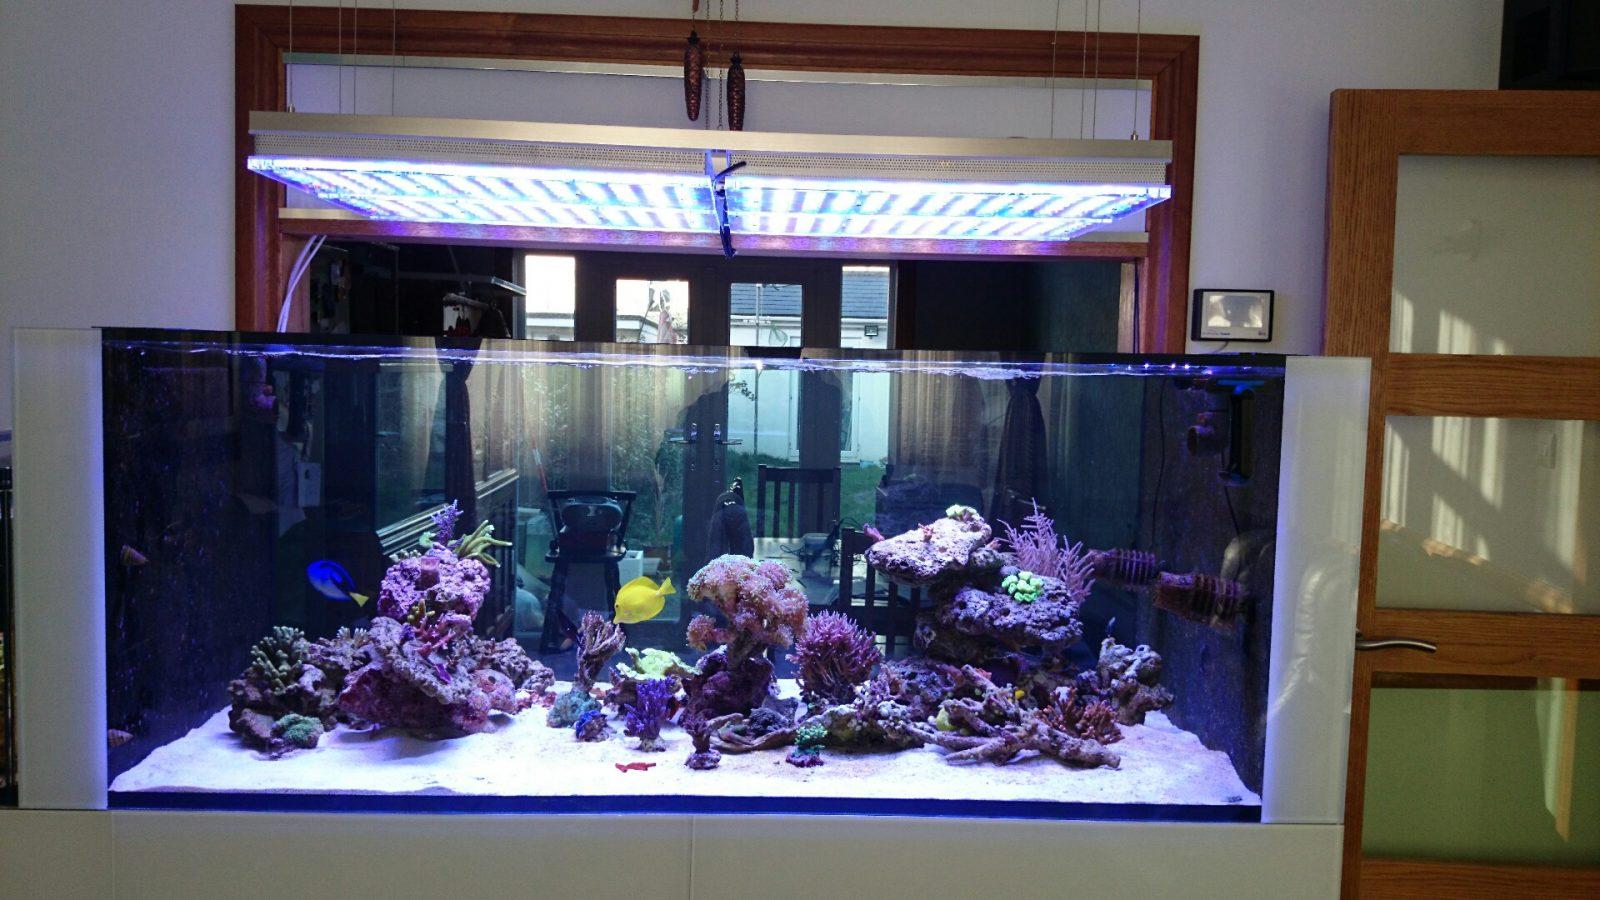 pencahayaan LED pertumbuhan karang terbaik 2020